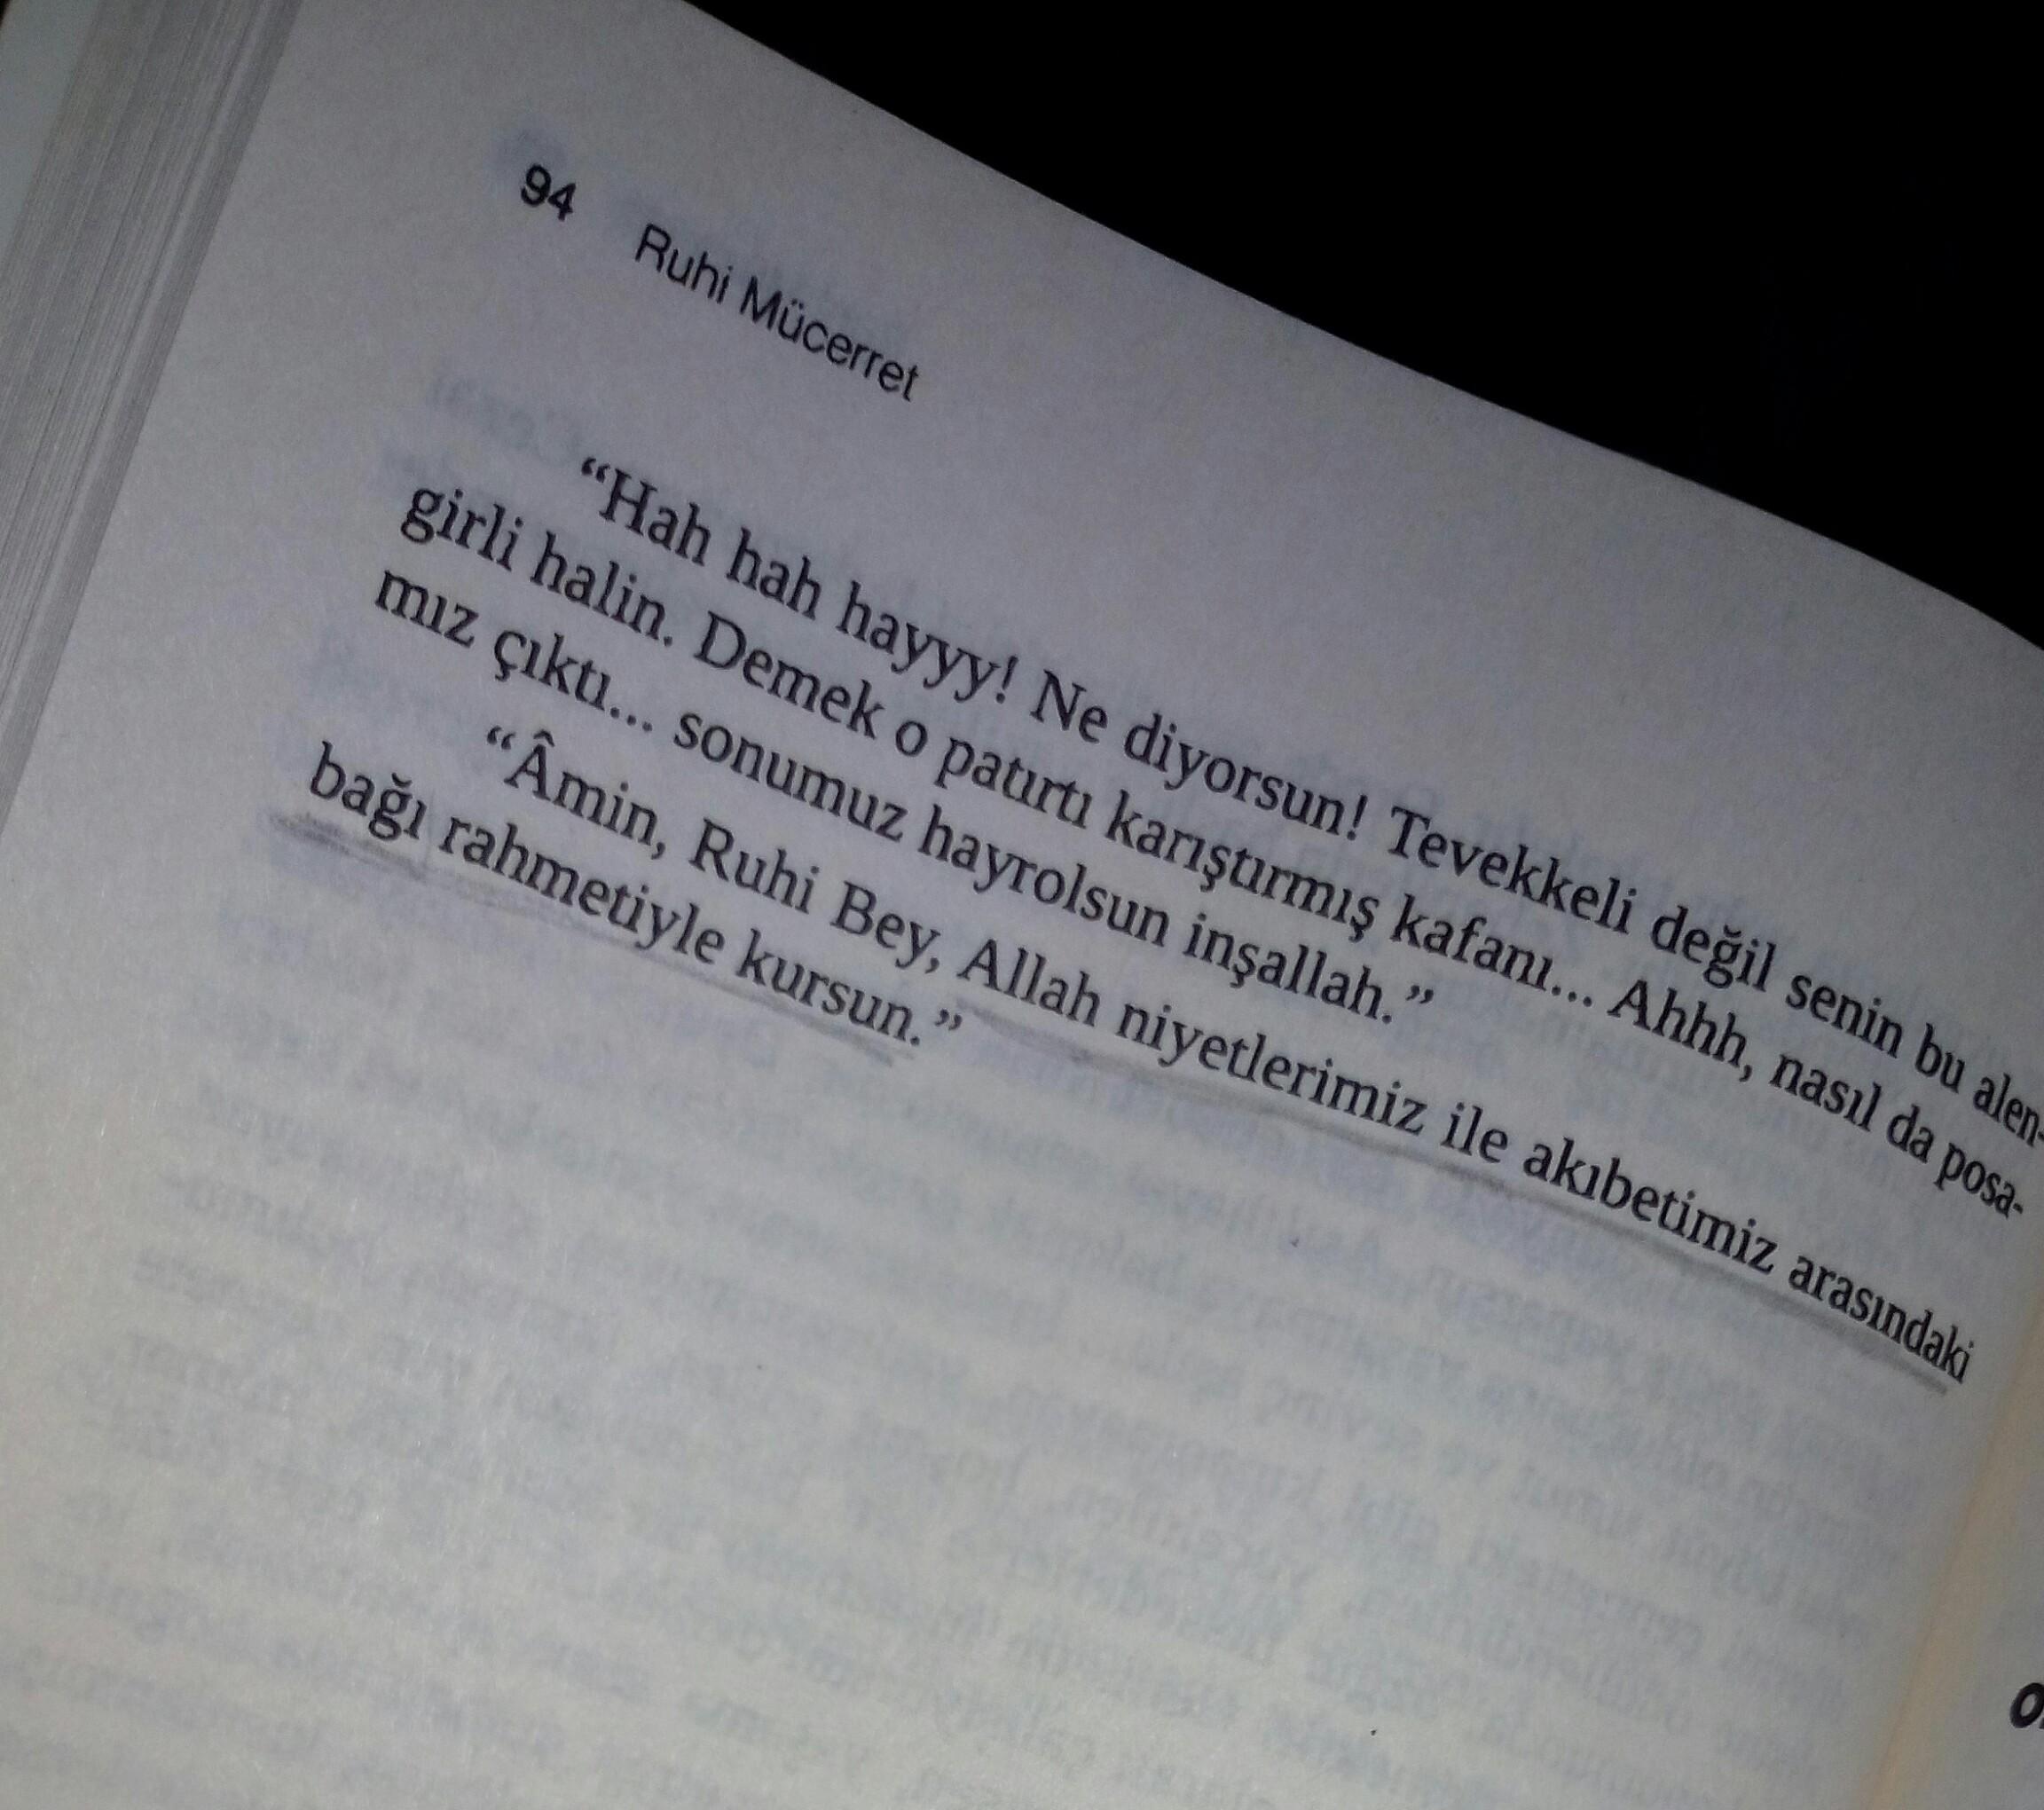 sevilen kitap cümleleri